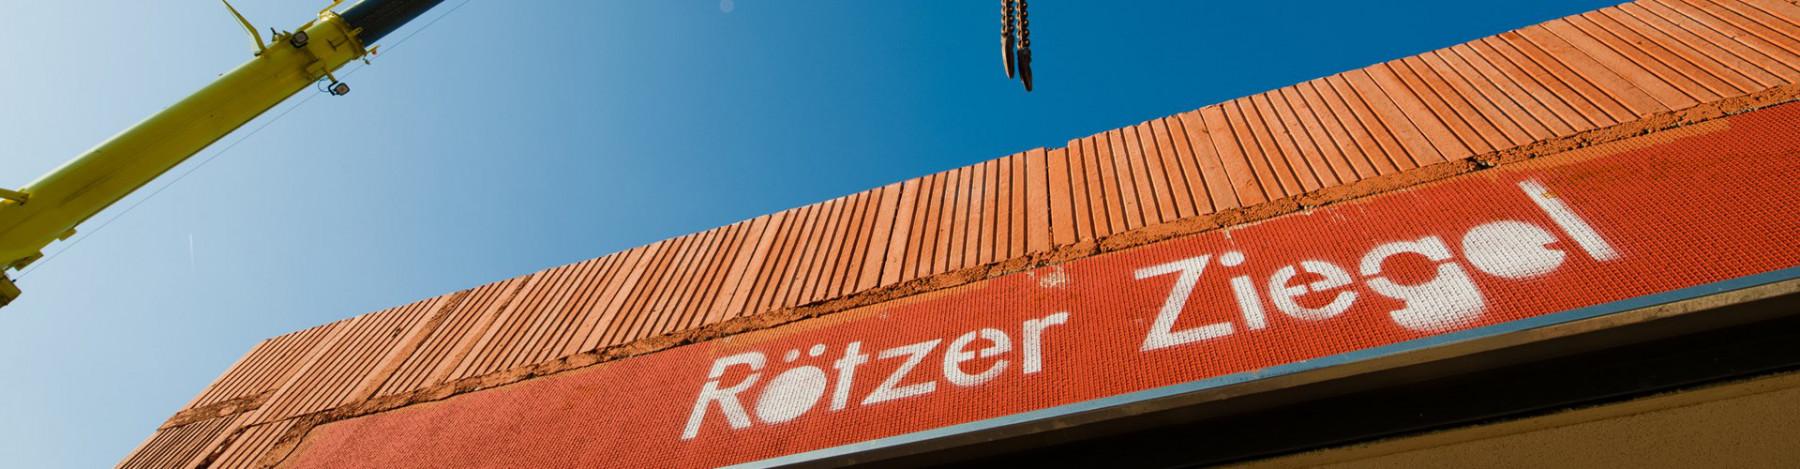 roetzer2.jpg